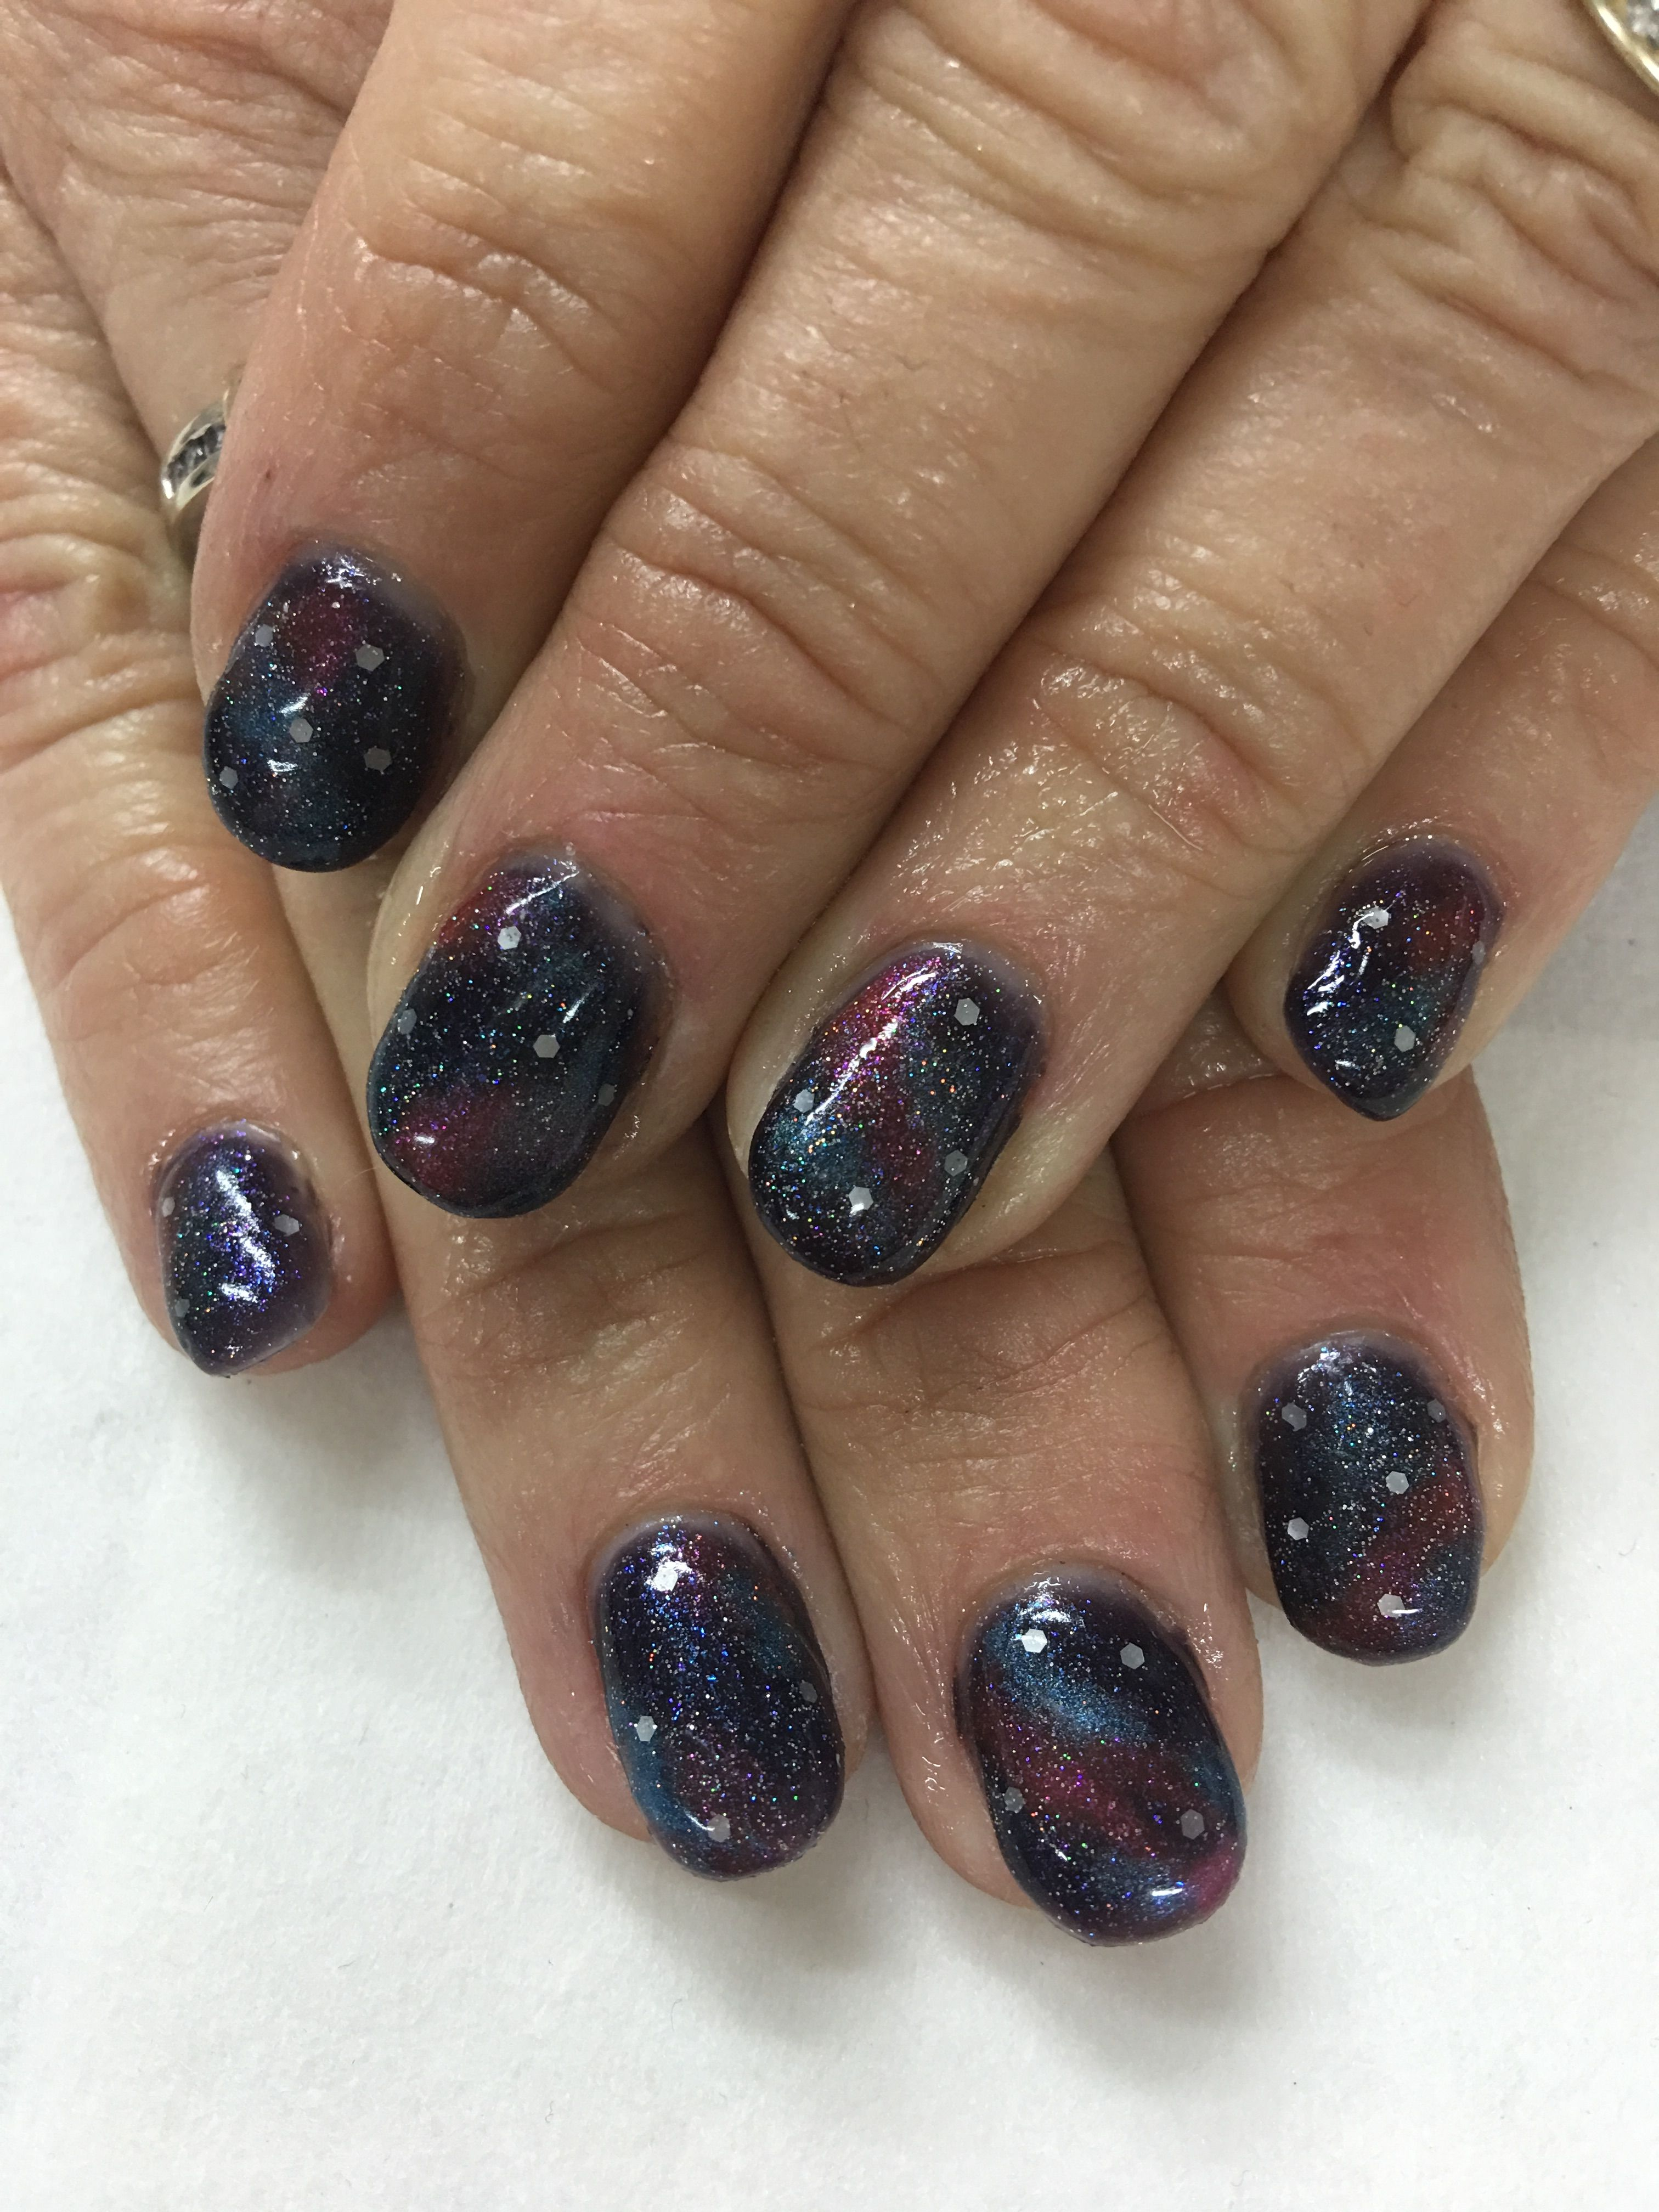 Midnight Blue Galaxy Gel Nails | Gel Nail designs | Pinterest